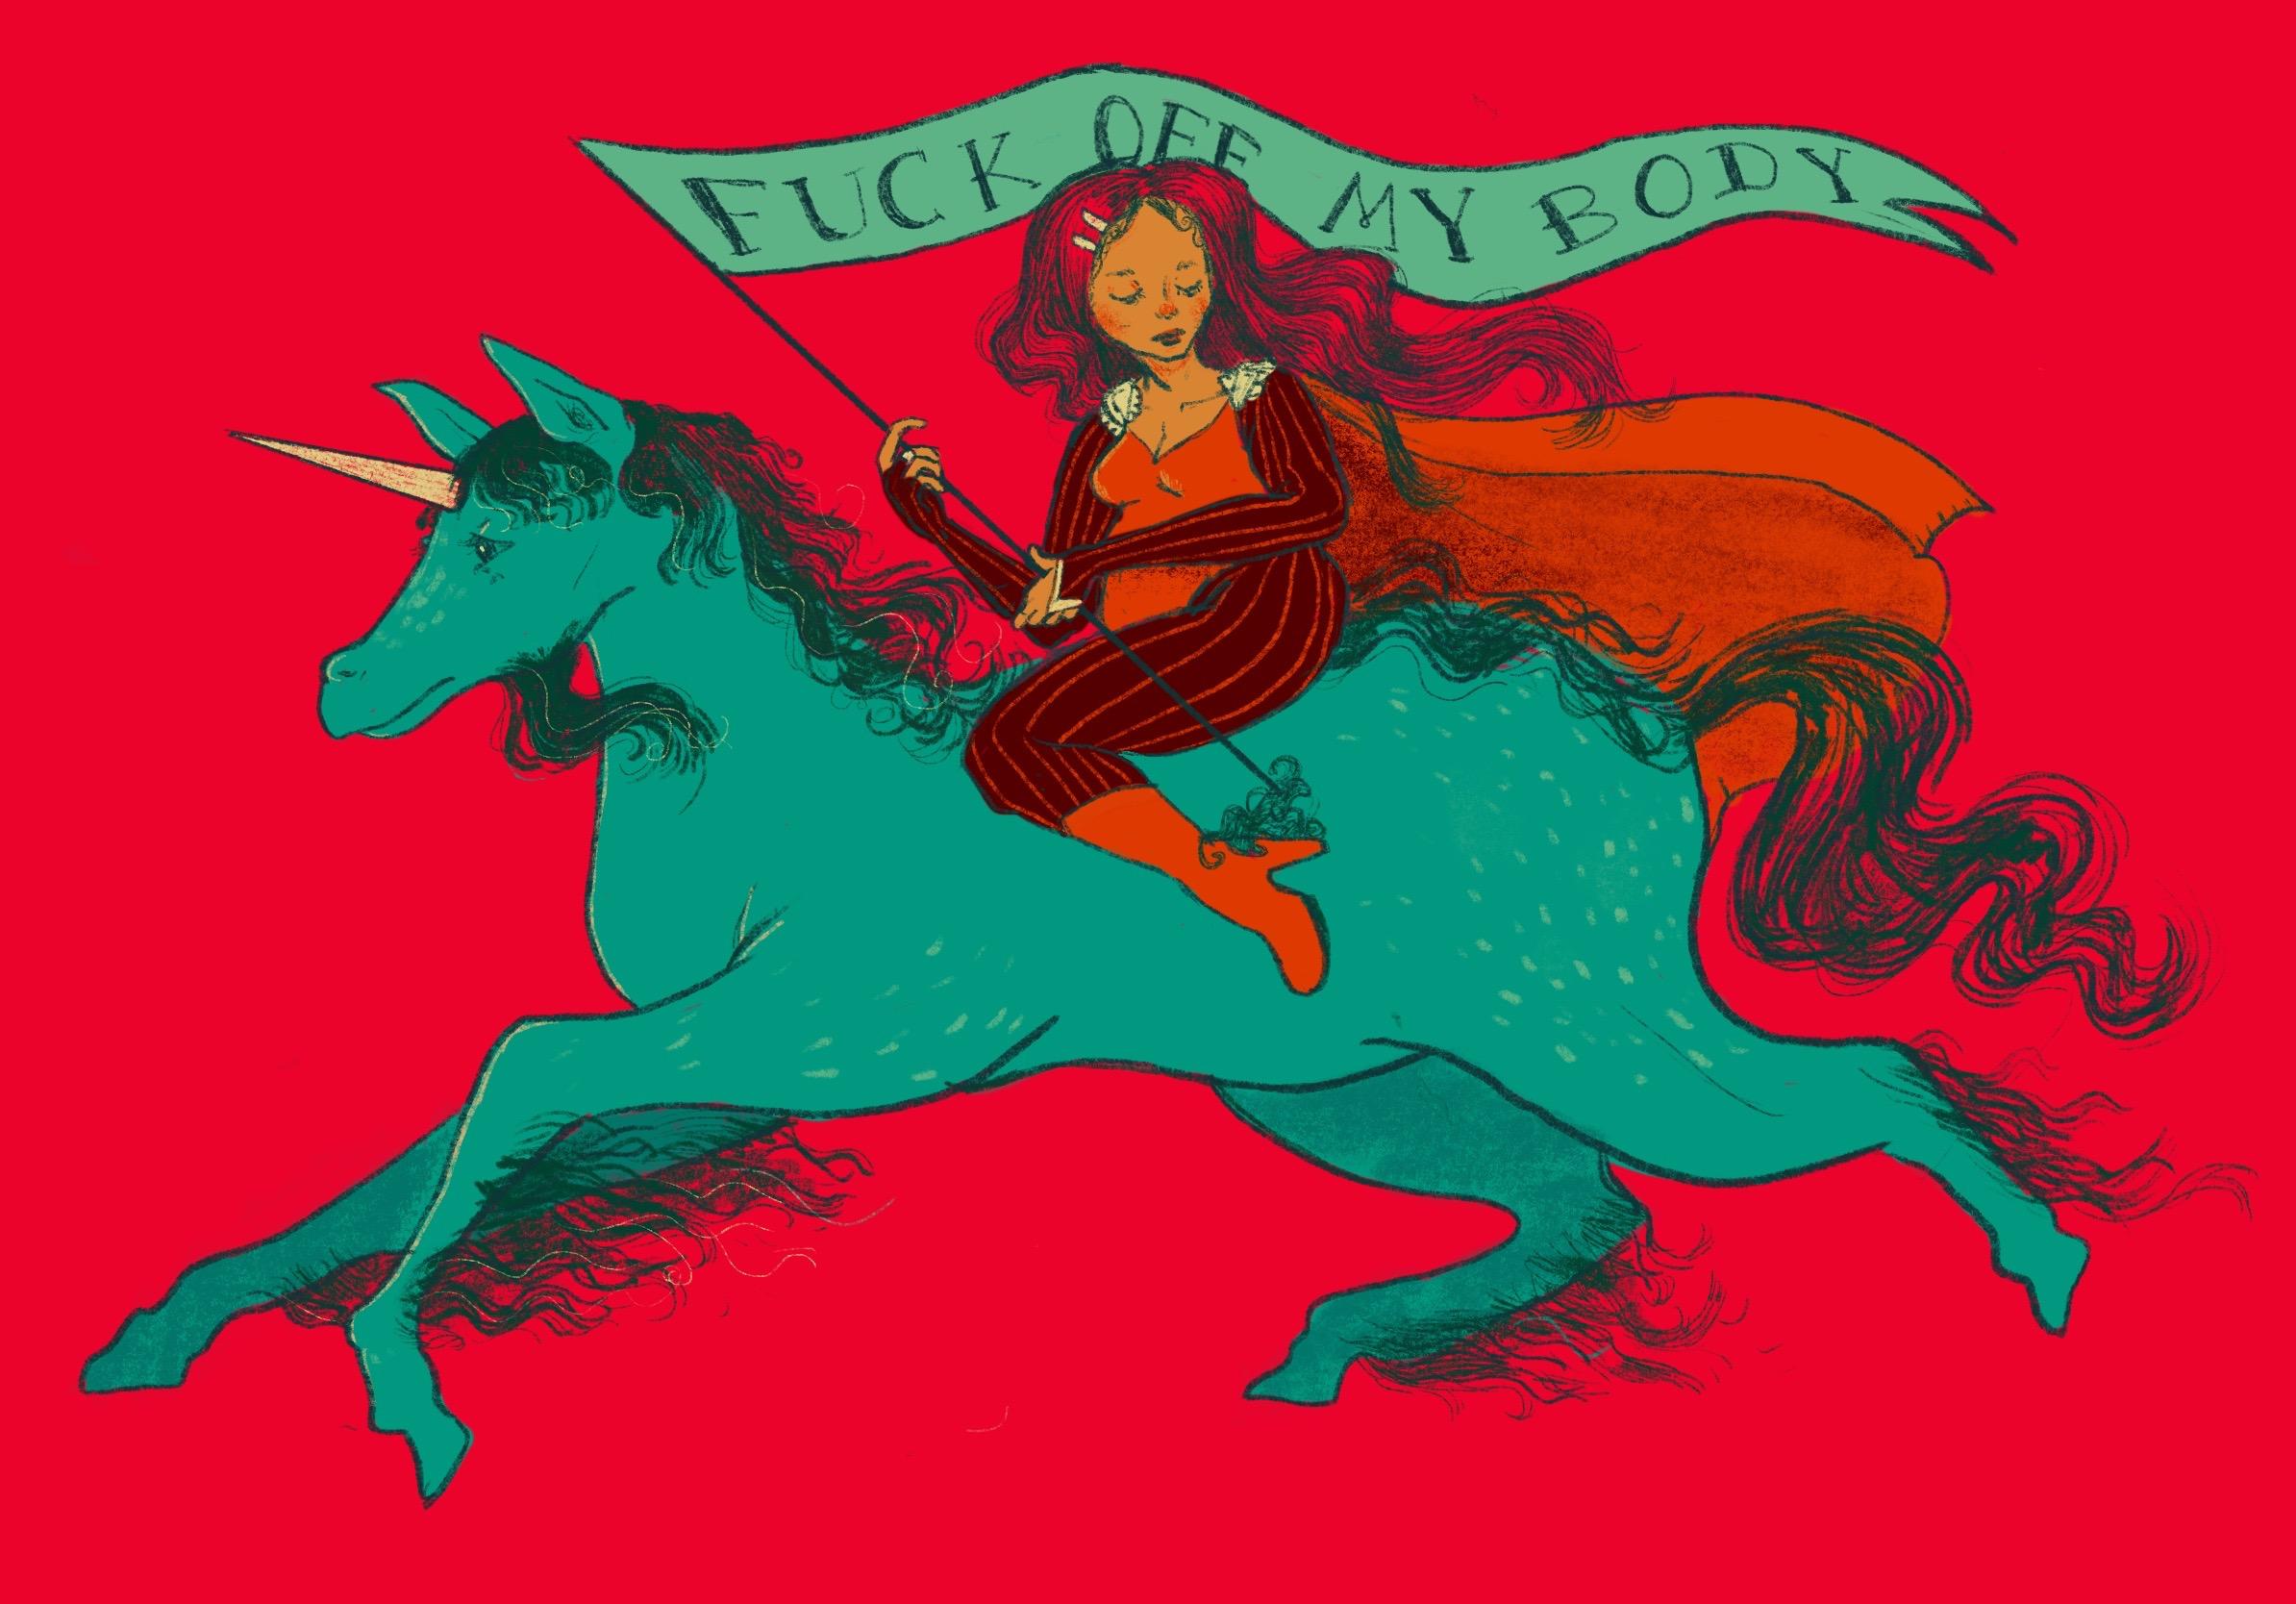 Fuck_Off_My_Body_I'm_Riding_A_Horse.jpg